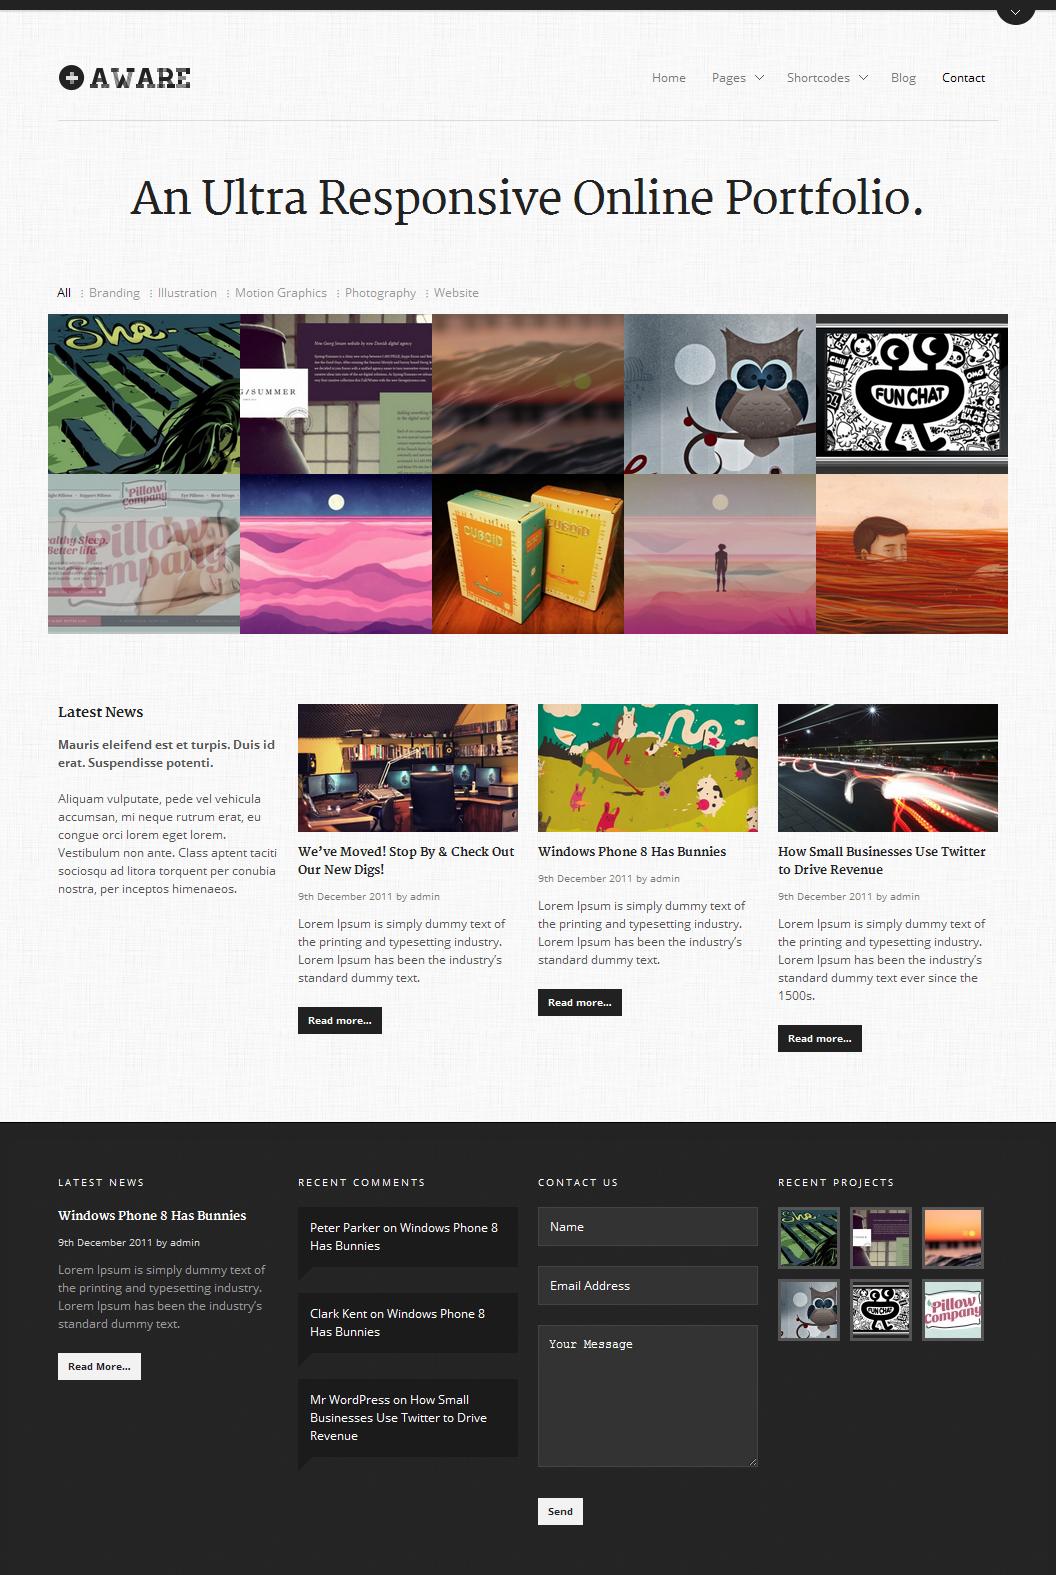 Wordpresstemplate Wordpress Theme Responsive Web Design Web Design Tools